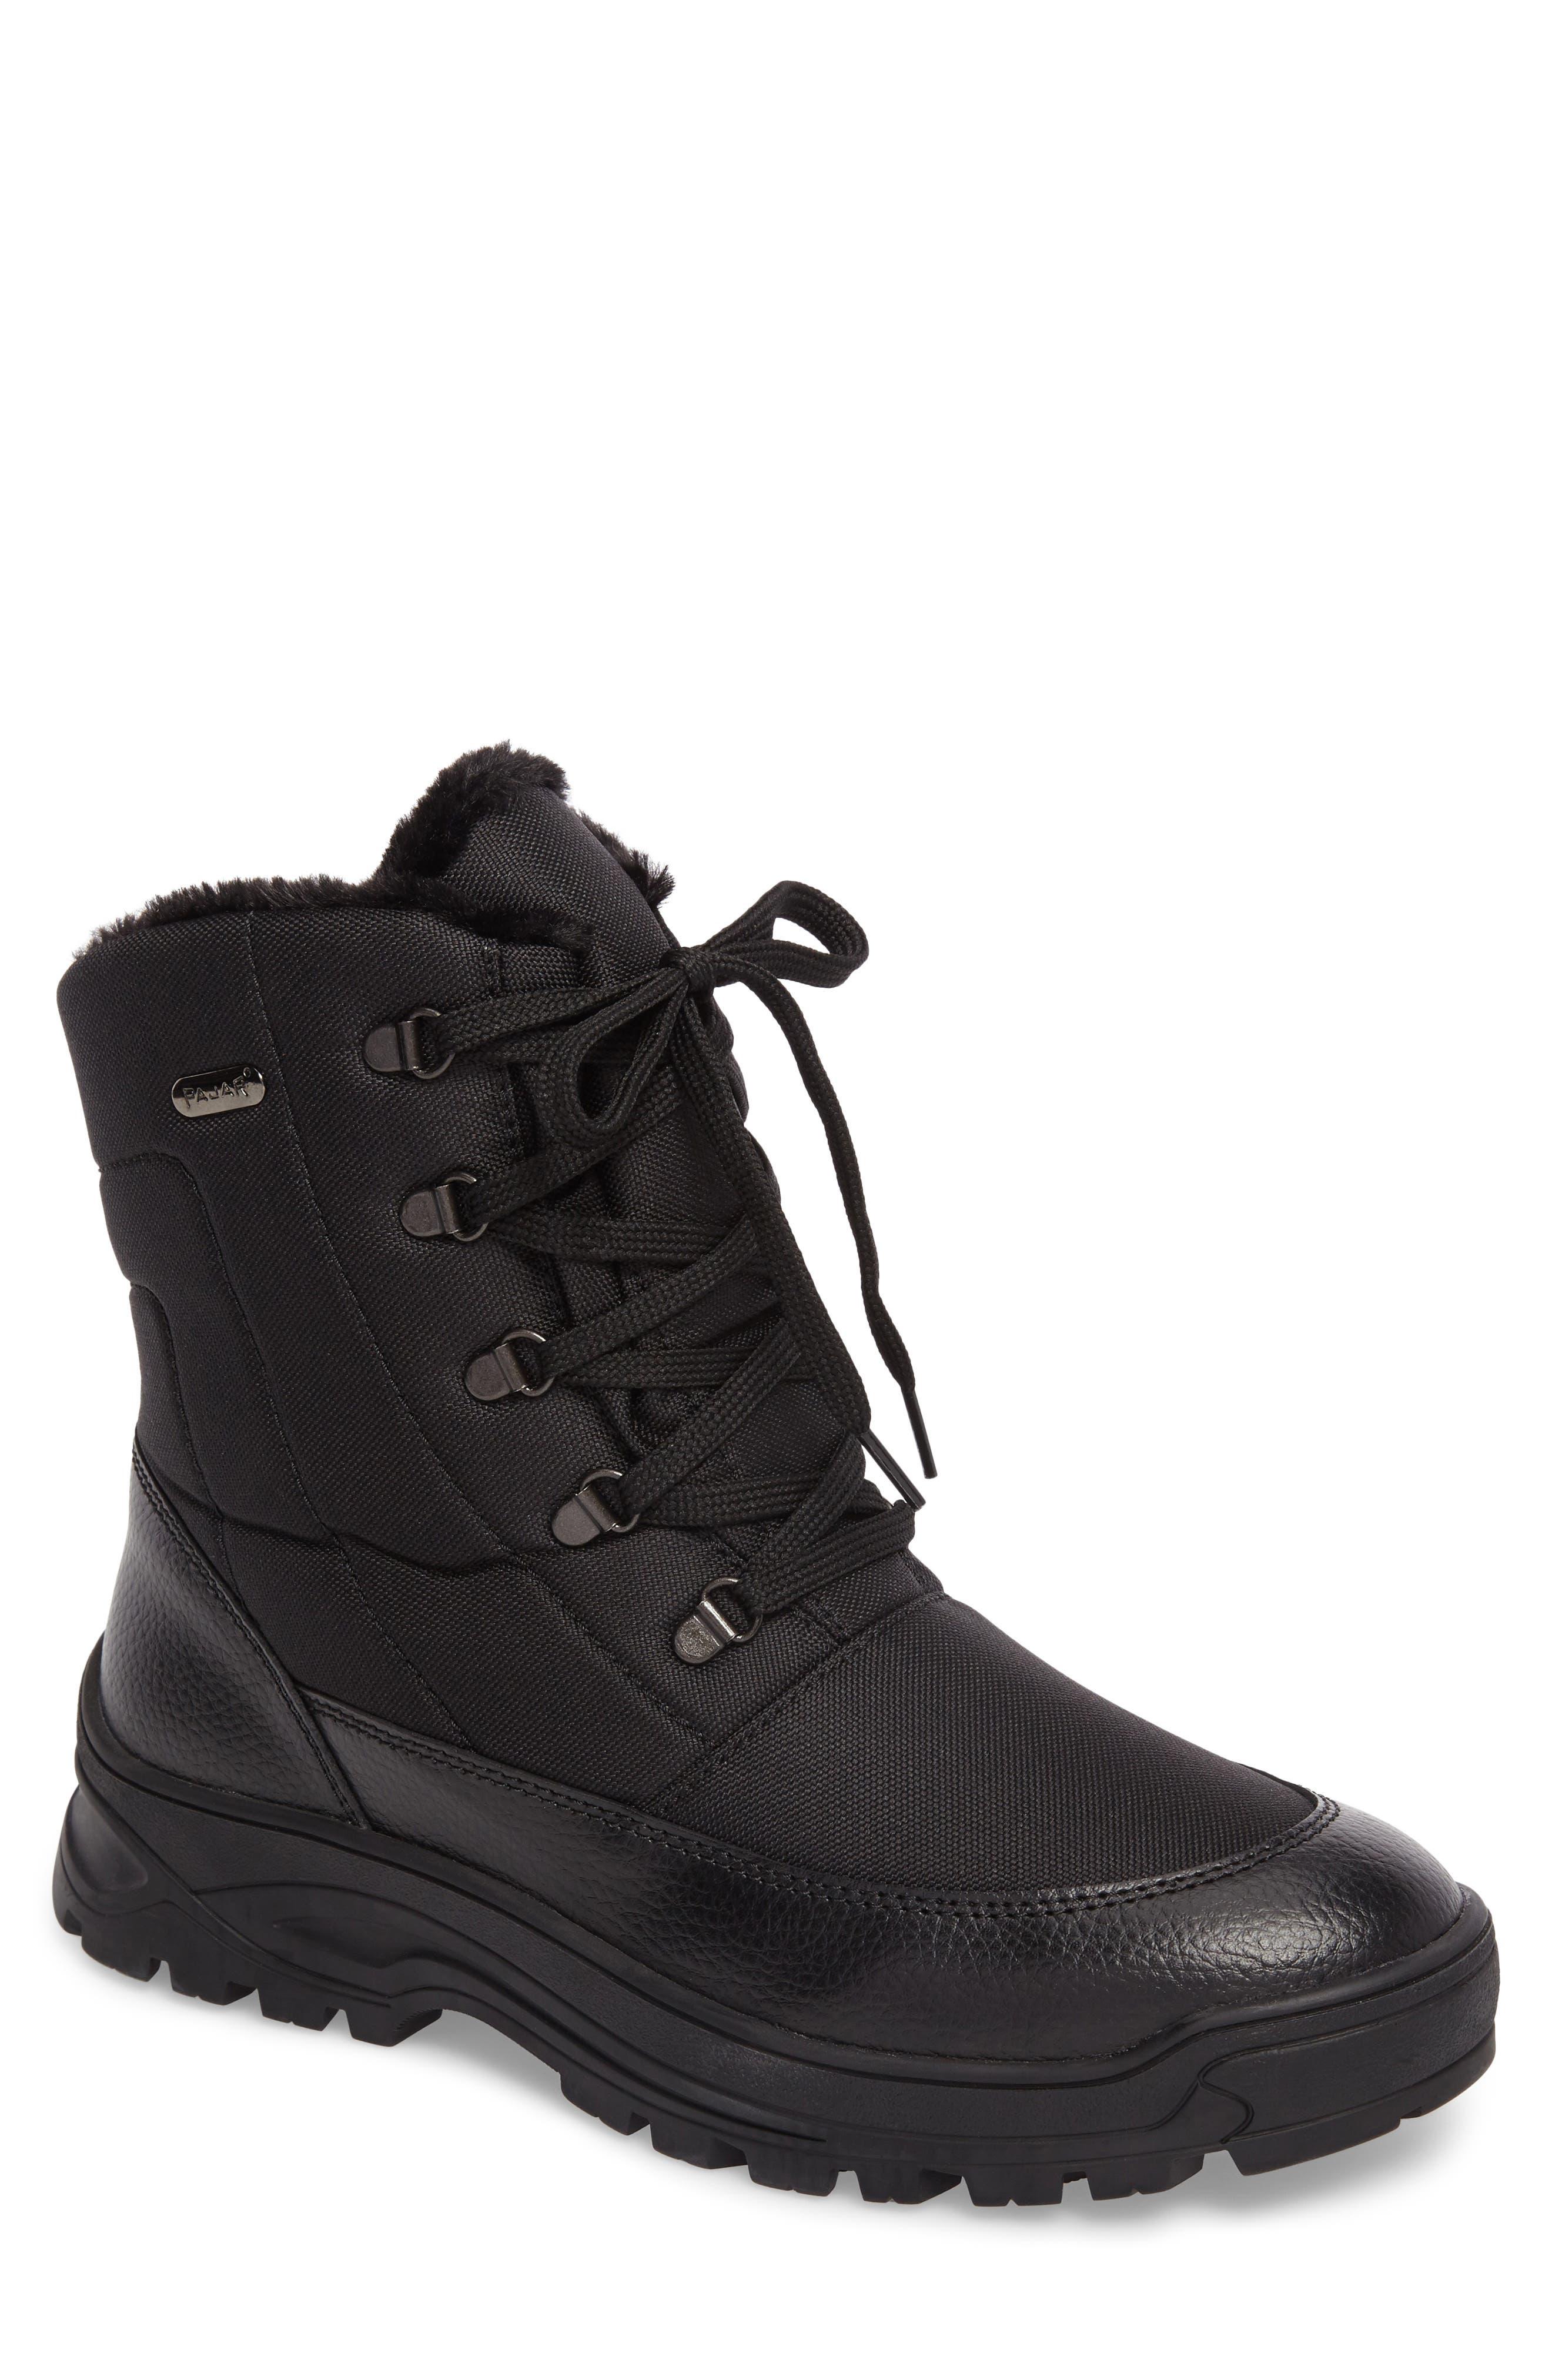 Trigger Winter Boot,                         Main,                         color, Black